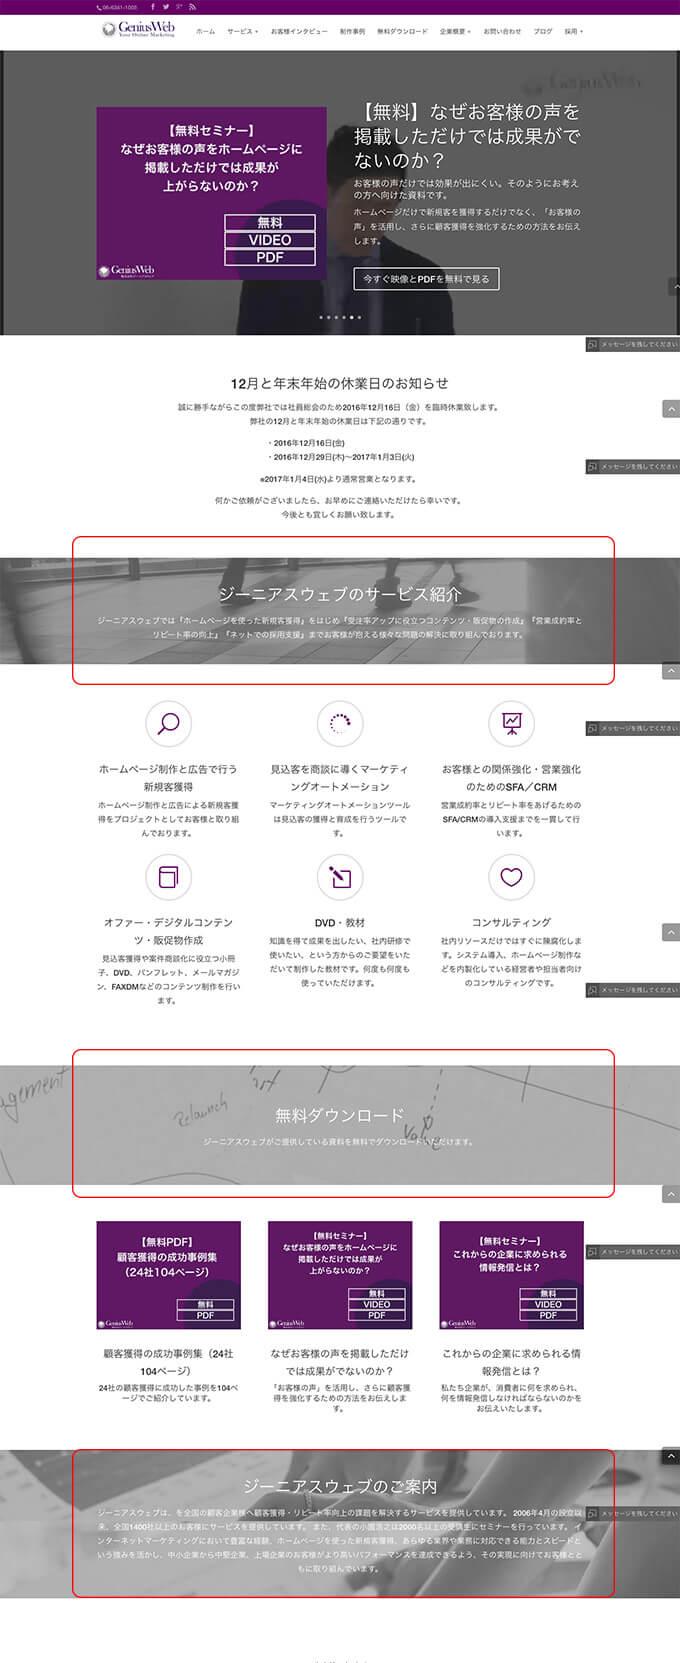 screencapture-genius-web-co-jp-1481587639014